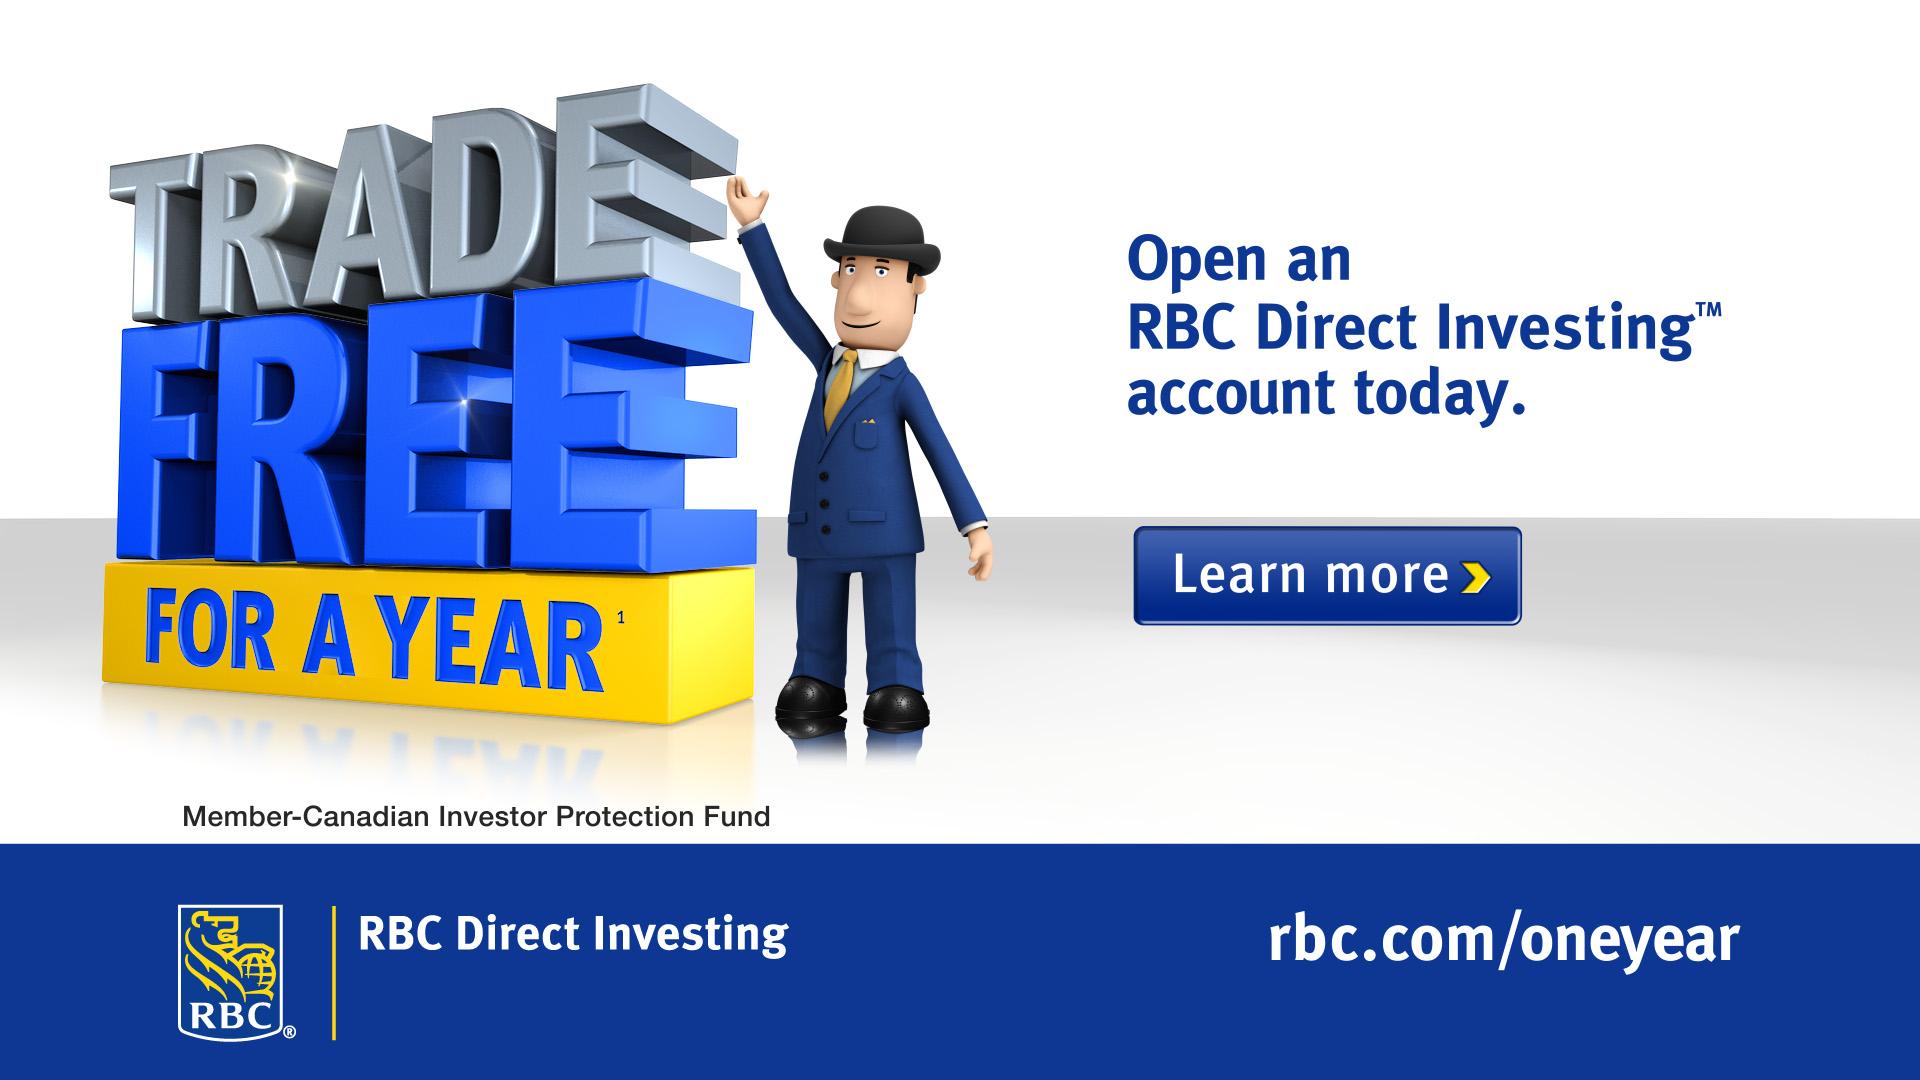 rbc_directinvesting_image03